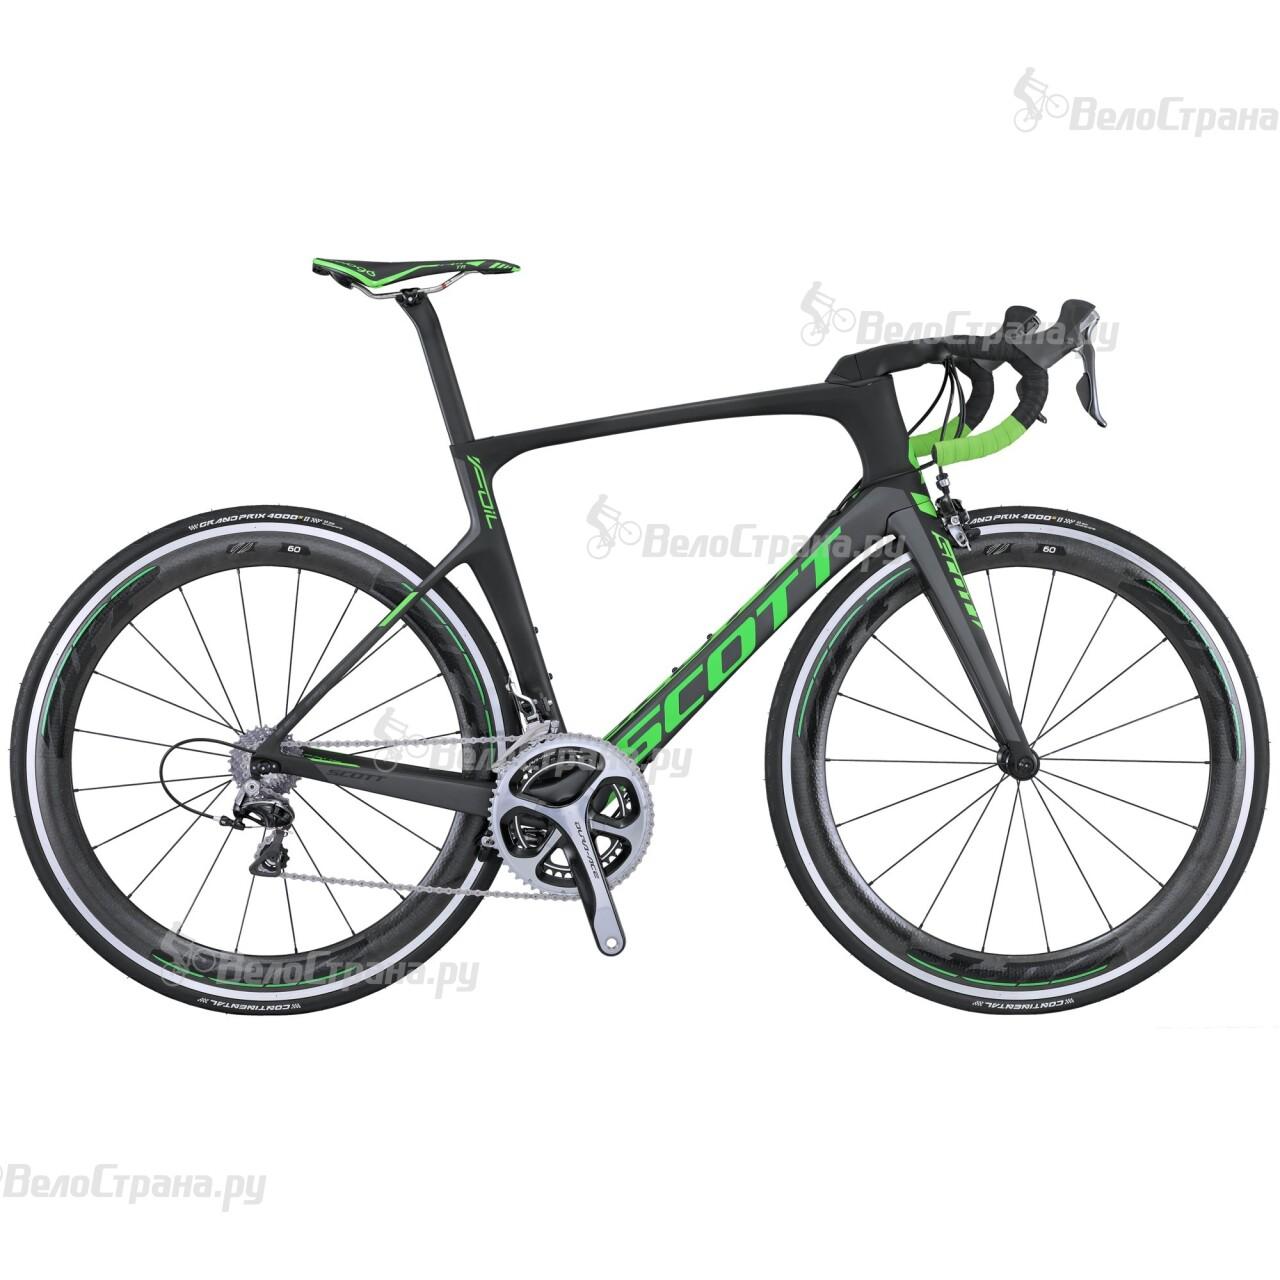 Велосипед Scott Foil Team Issue (2016) велосипед gt sanction team 2016